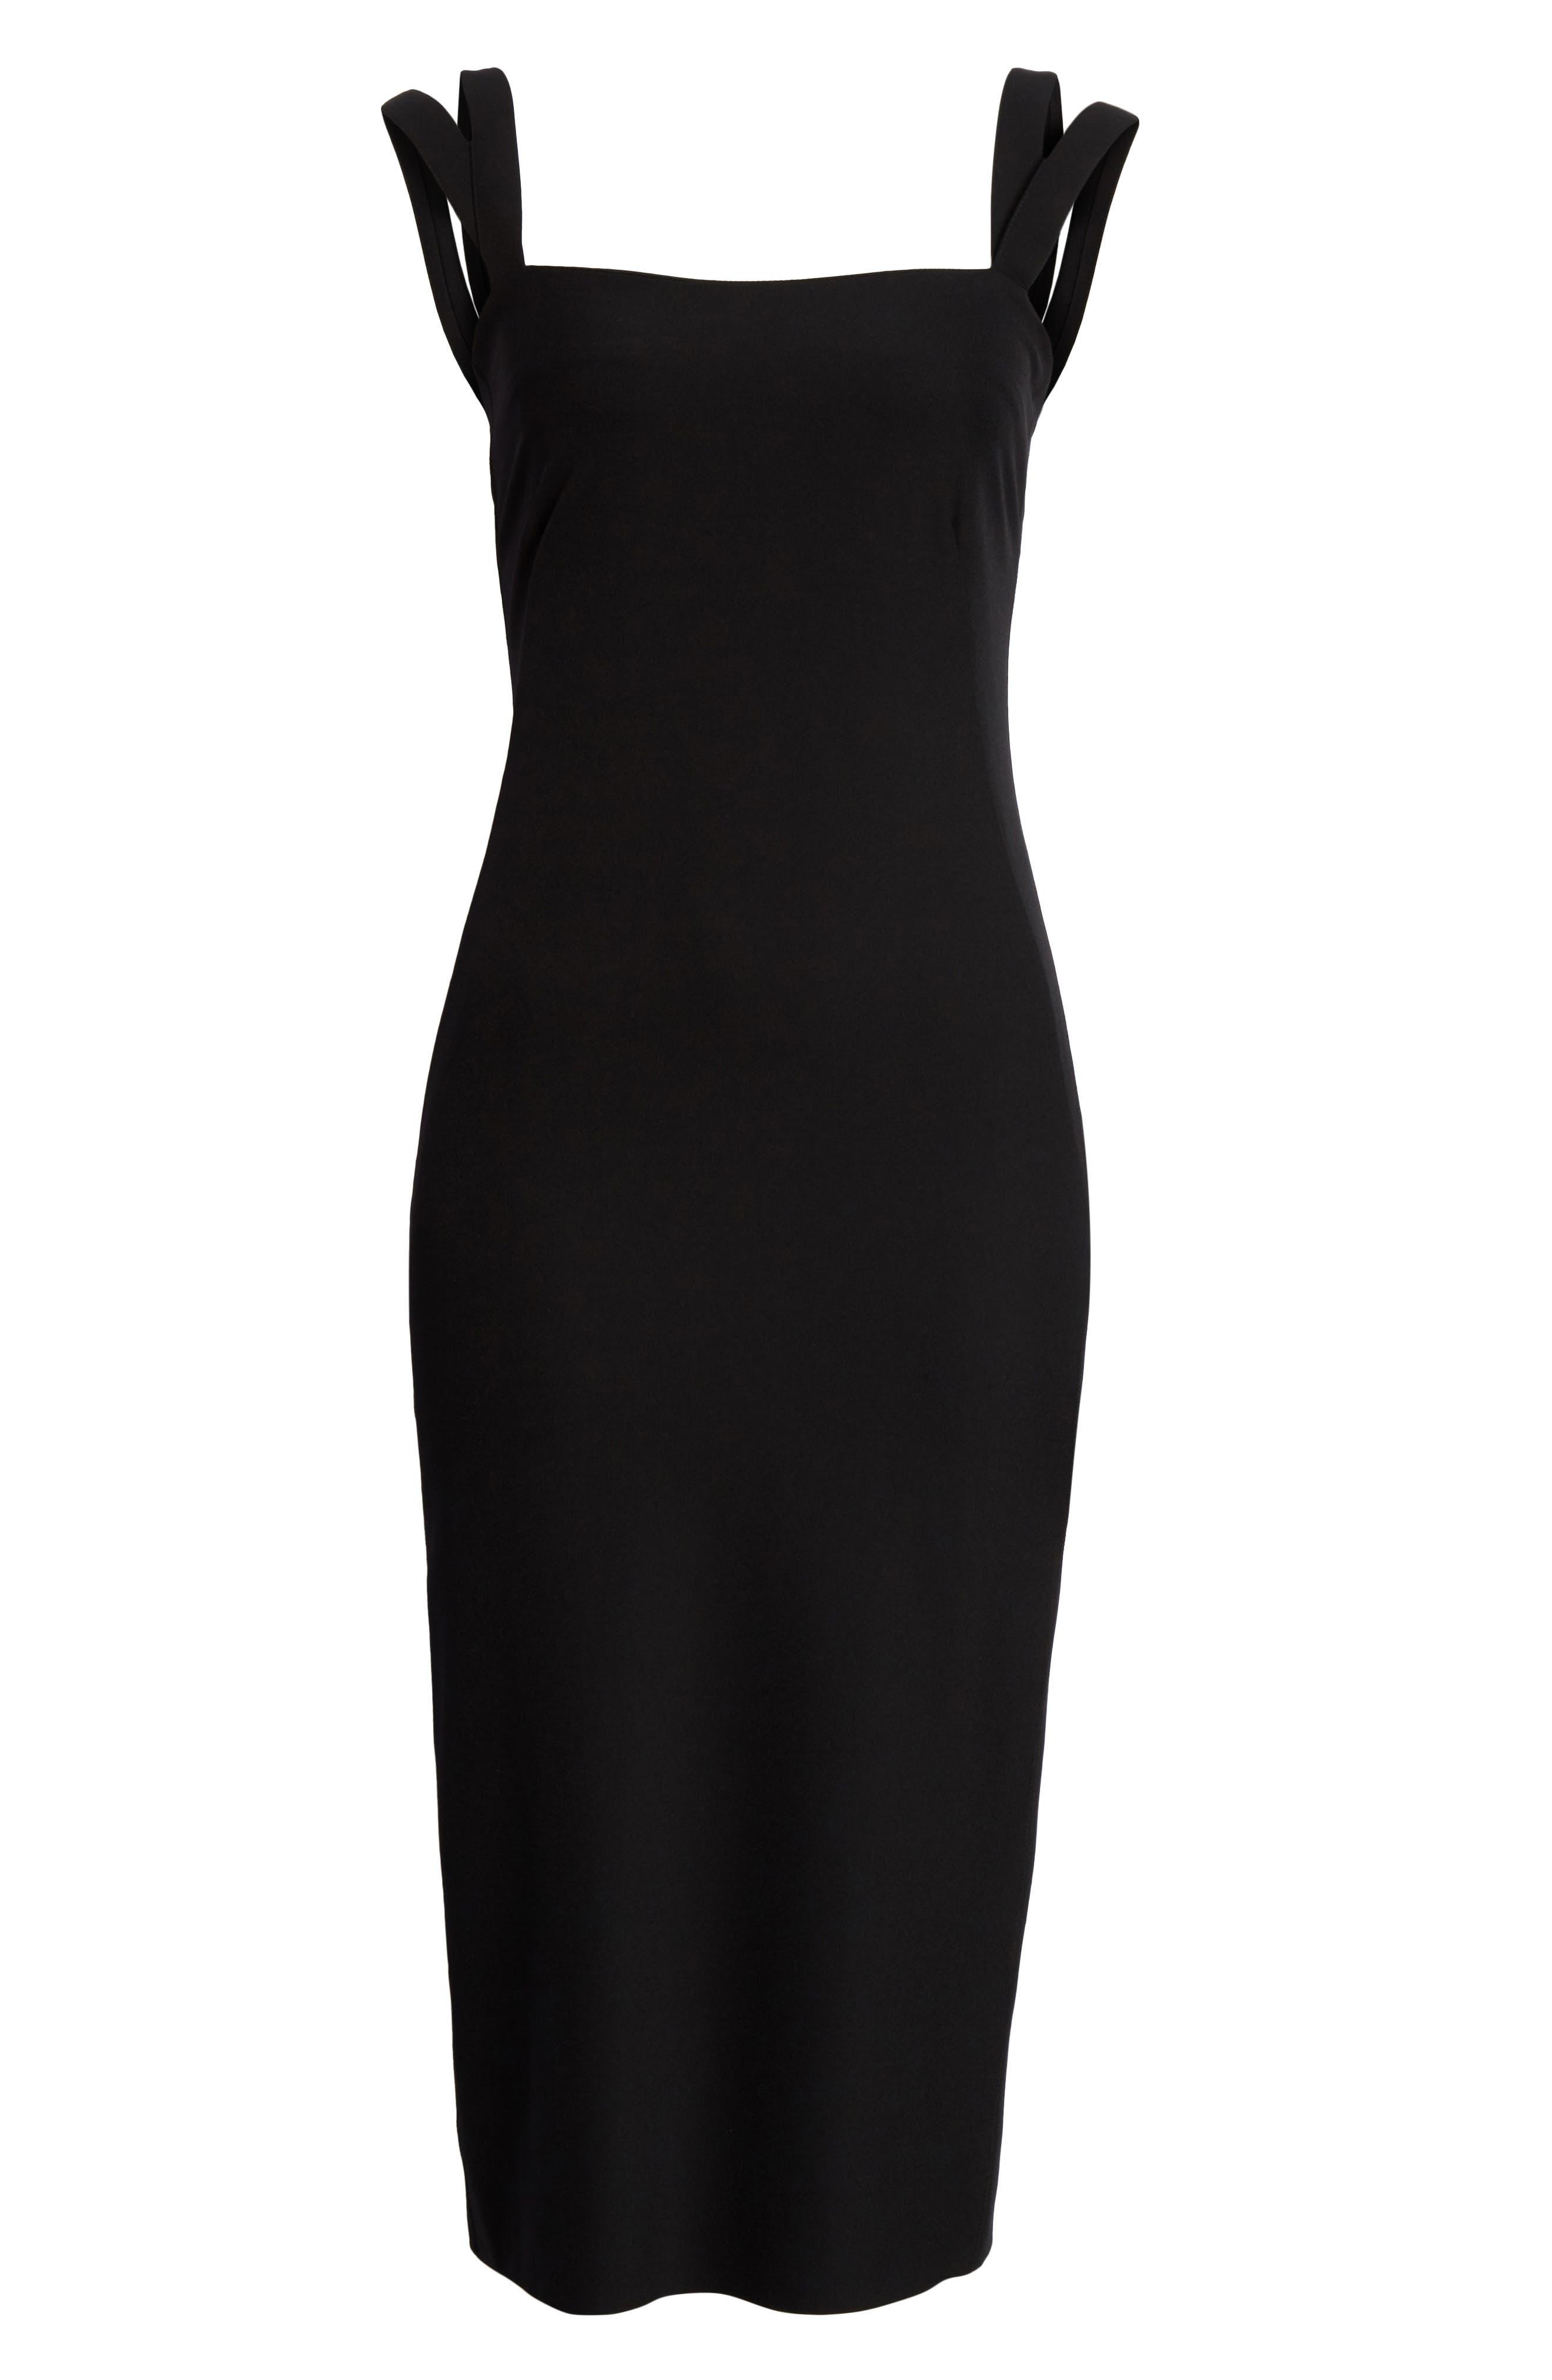 Perform Tech Perfect Sheath Dress,                             Alternate thumbnail 6, color,                             Black